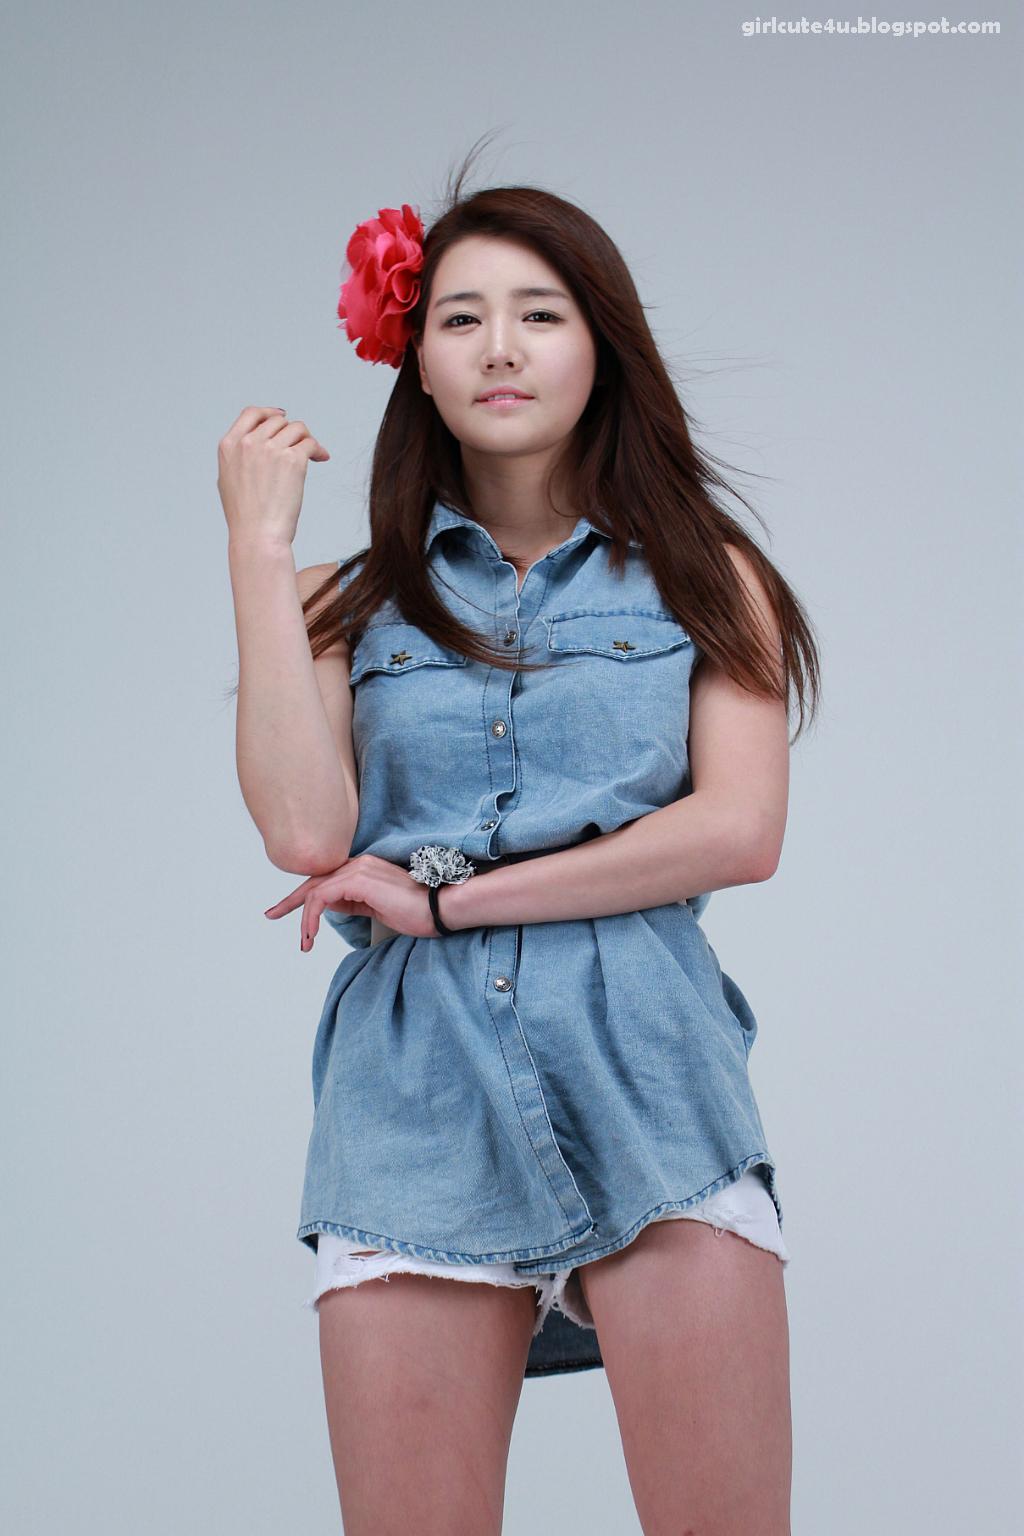 xxx nude girls: Han Ga Eun - Cute Red School Girl